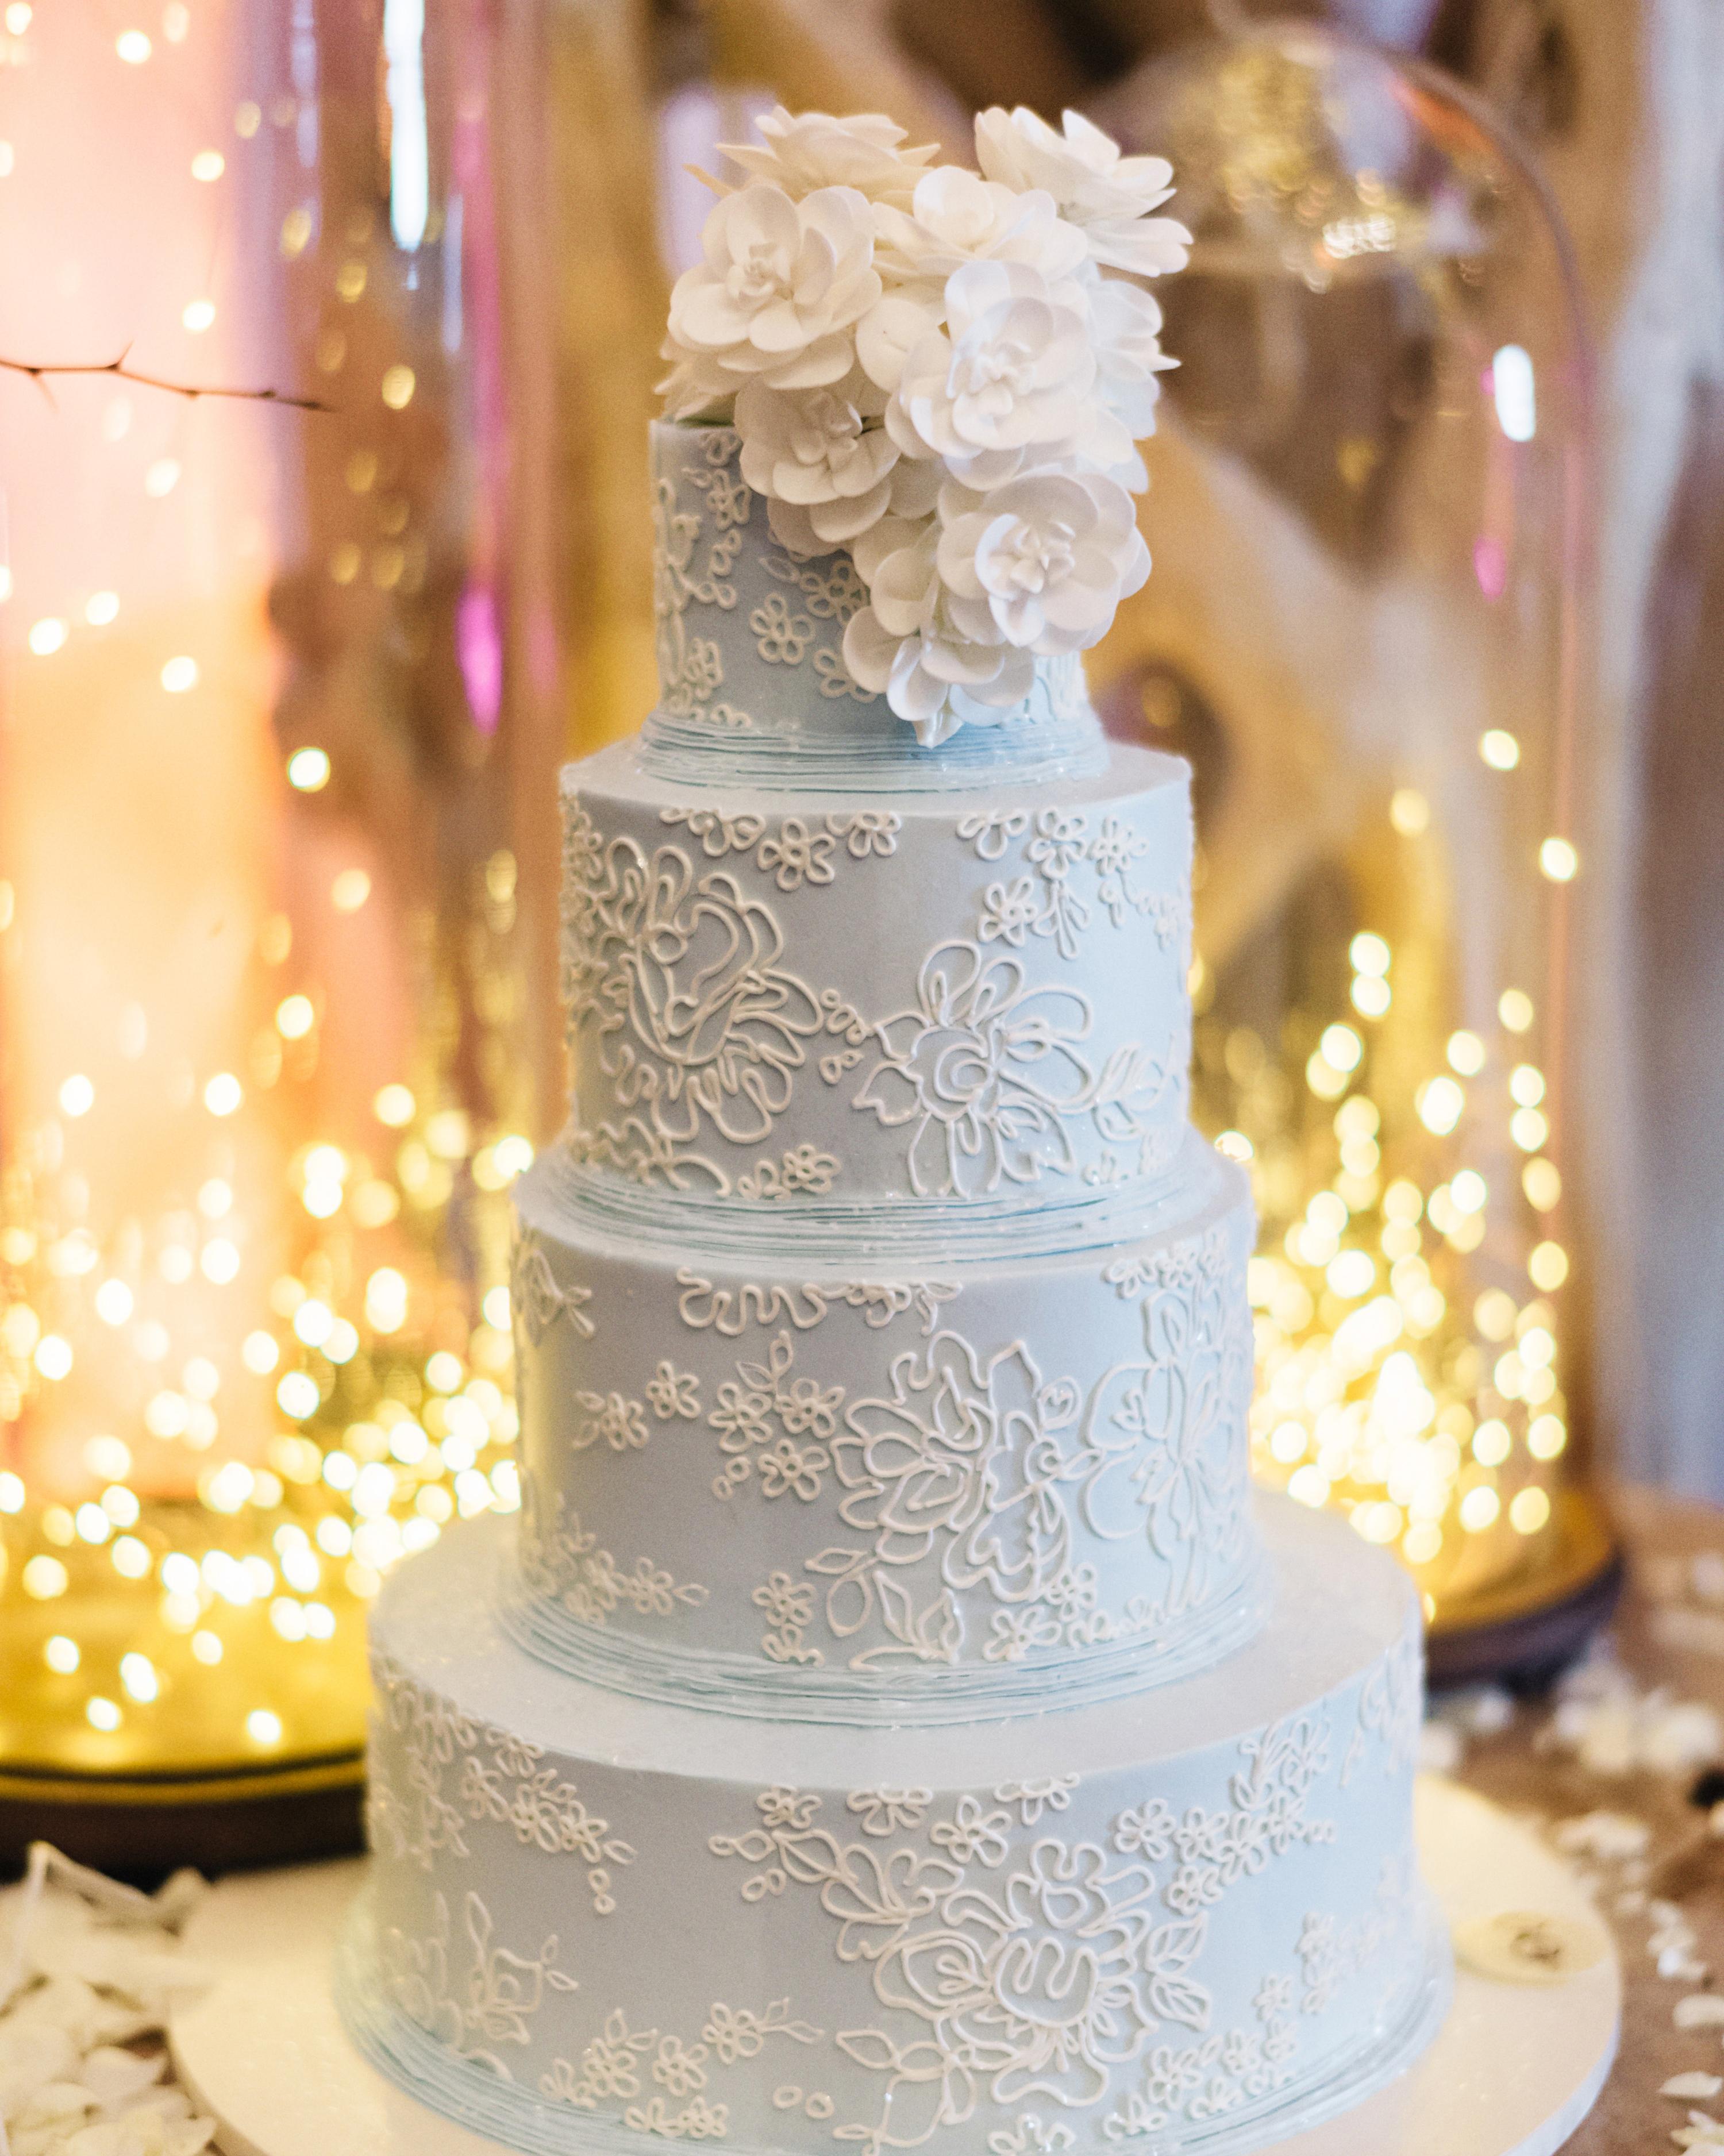 lori-jan-wedding-cake-01174-s112305-1215.jpg